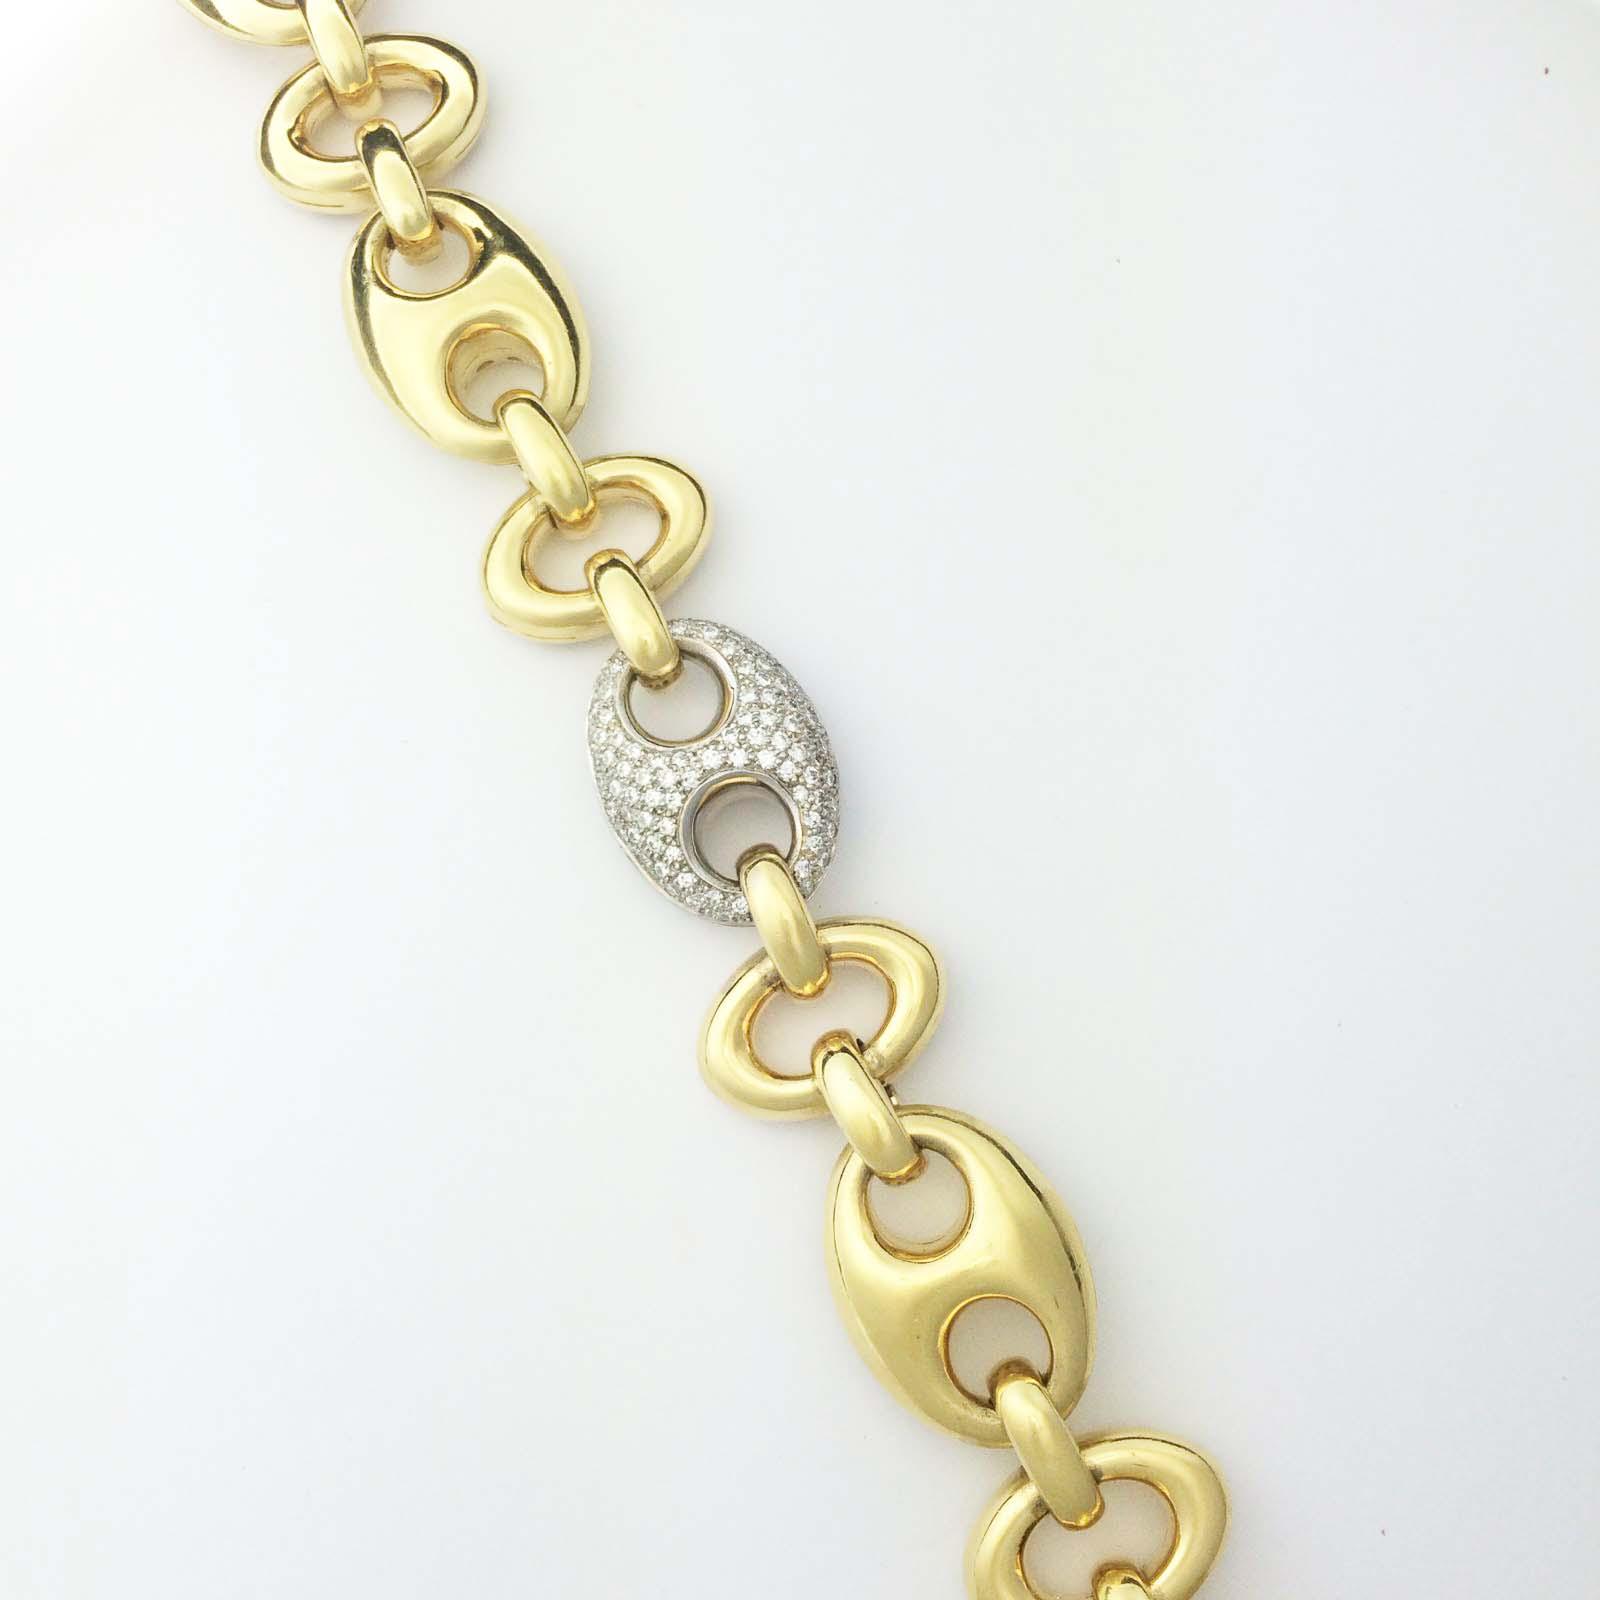 Heavy Italian bracelet with diamond link